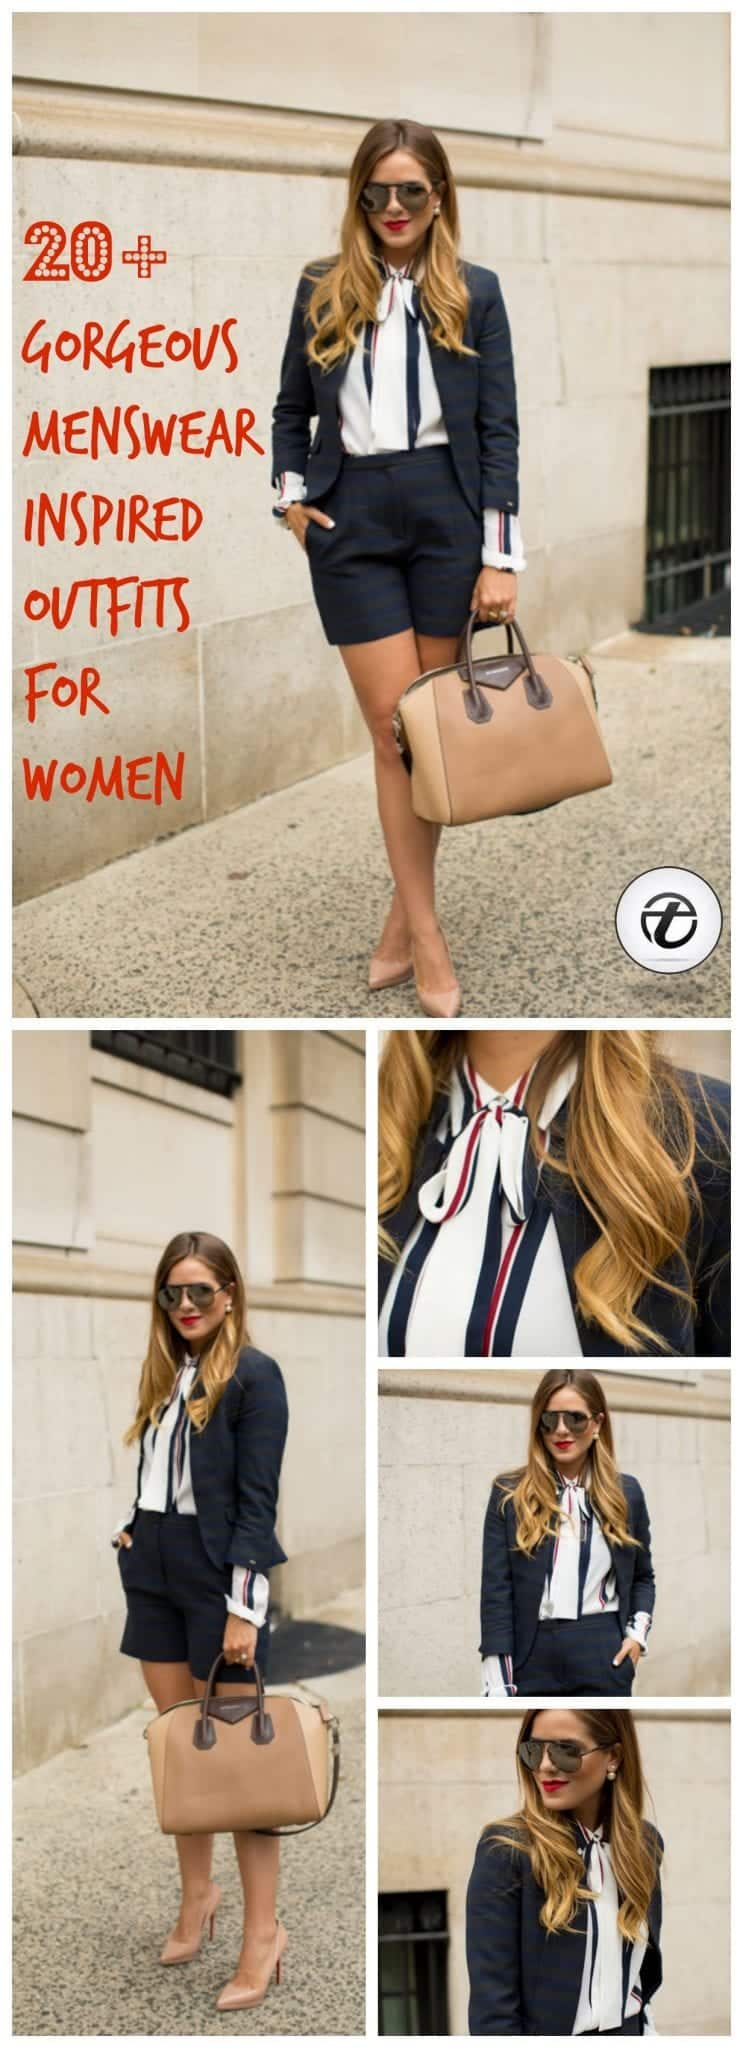 menswear-outfits-for-women-1 Menswear for Women - 20 Best Menswear Inspired Outfits Ideas